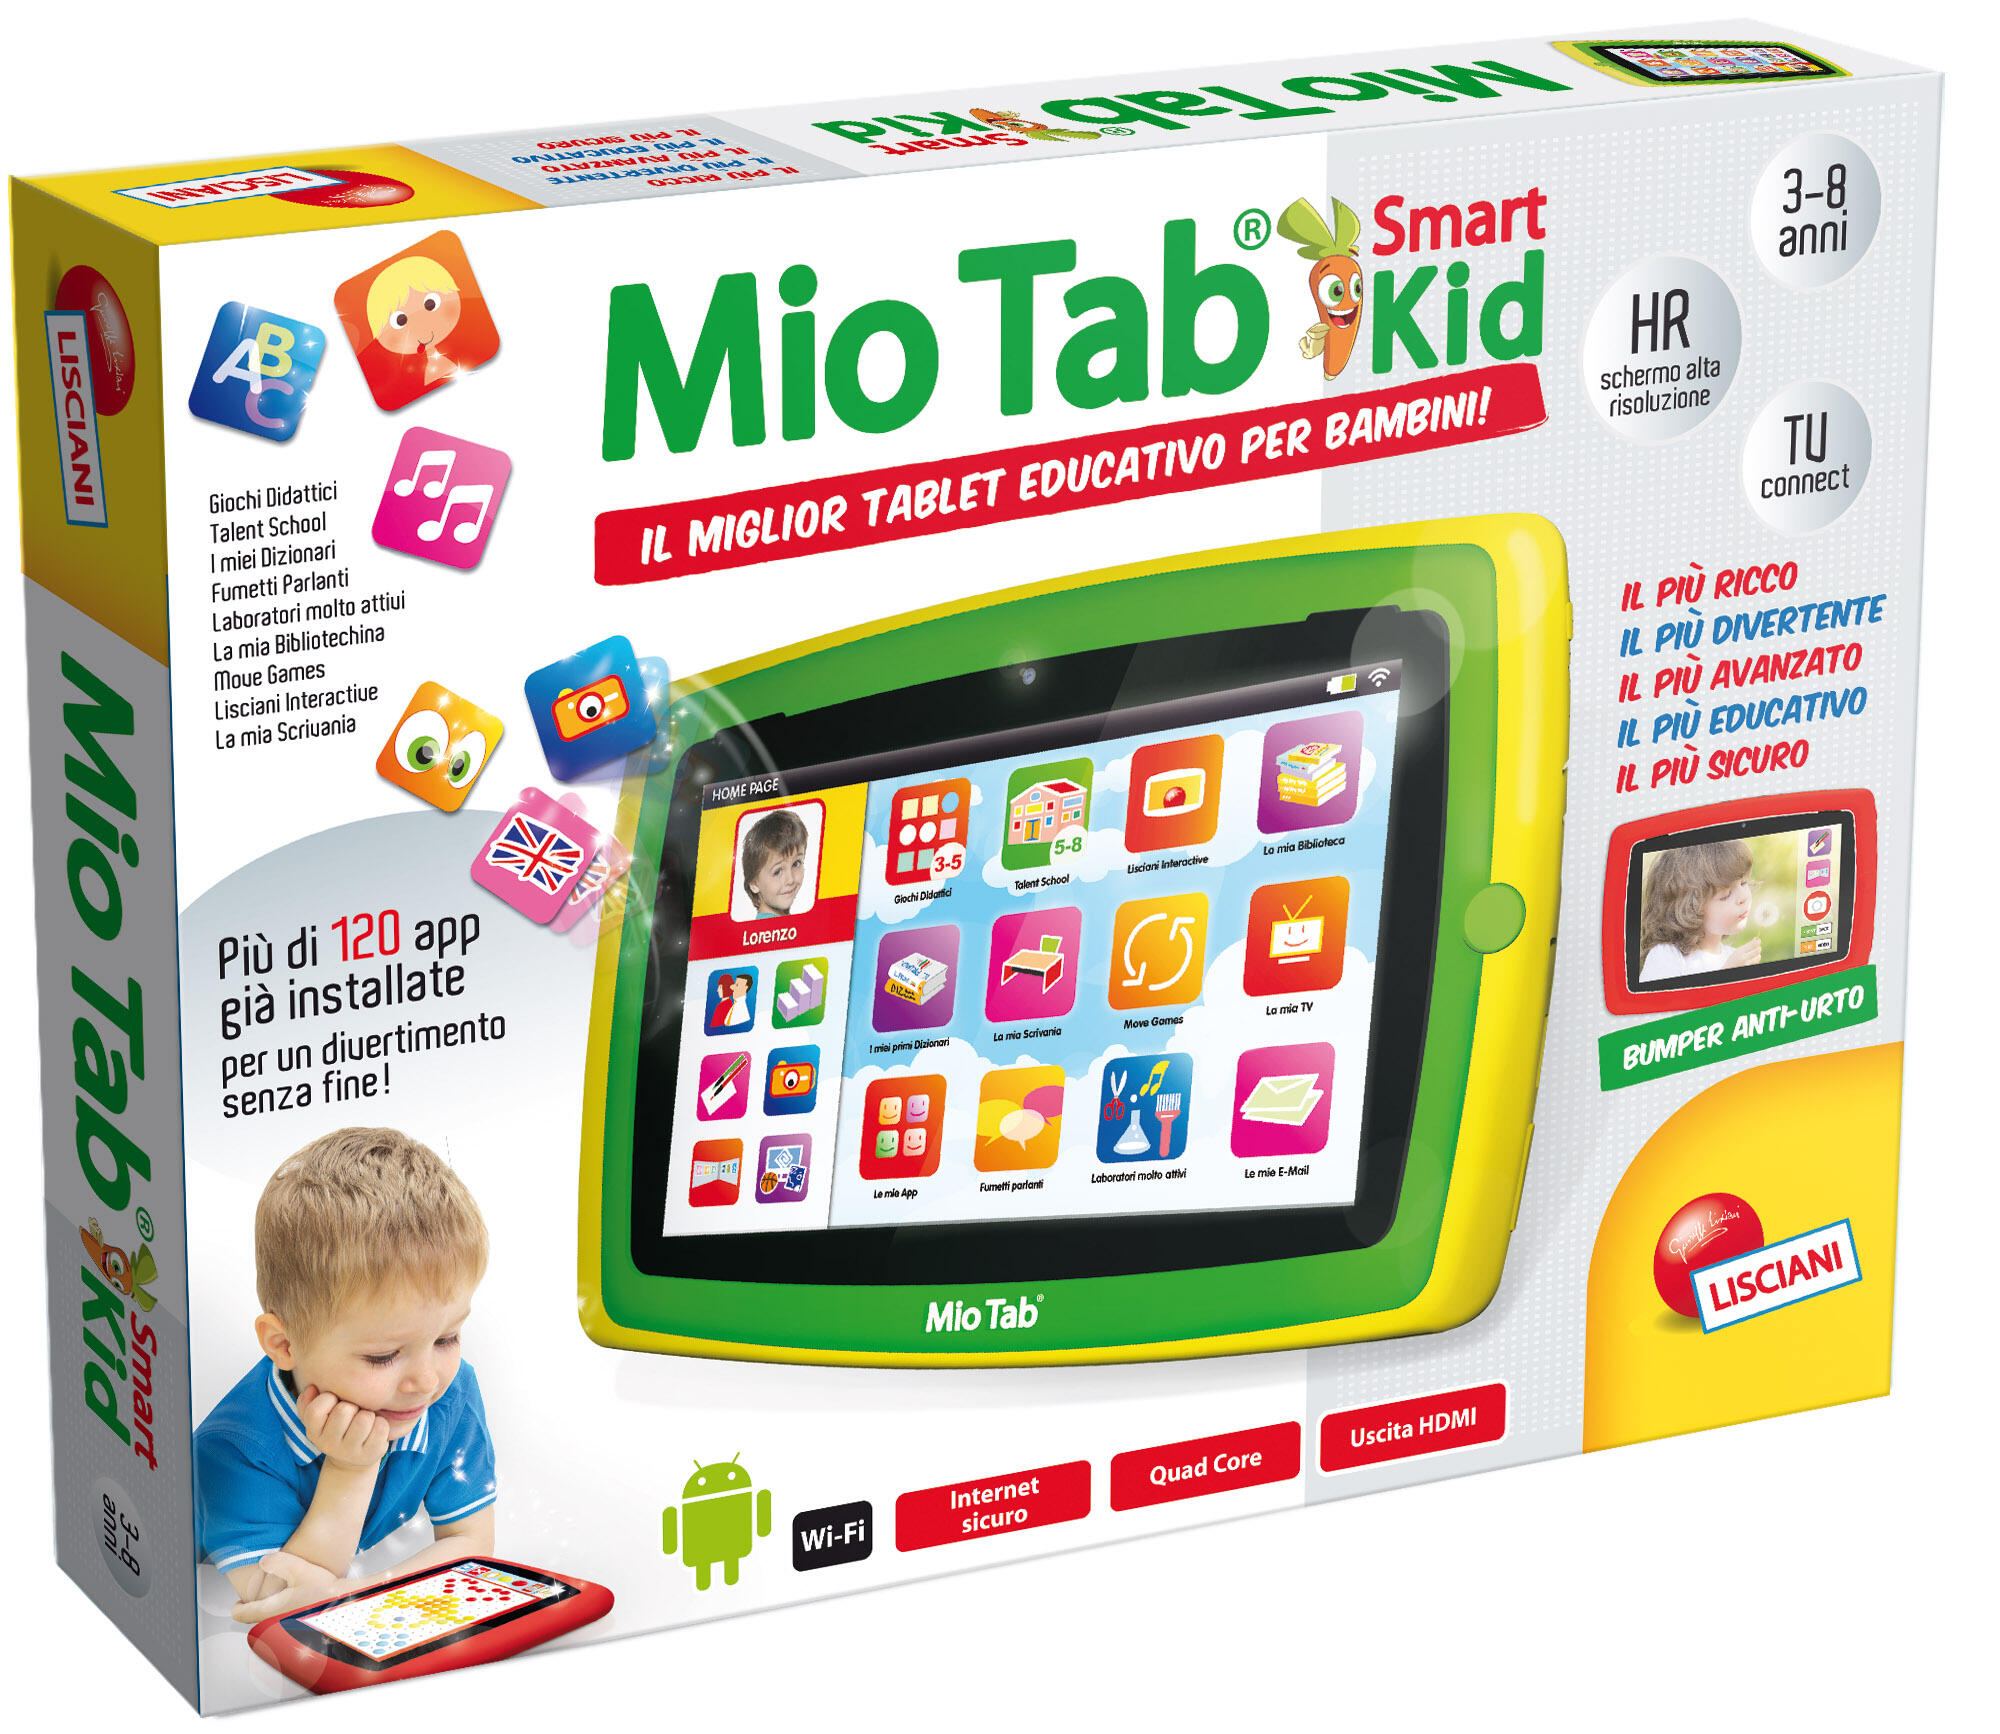 226cf49fd1 Mio Tab Smart Kid HD - Lisciani - Mio Tab 2013 - Elettronici ...